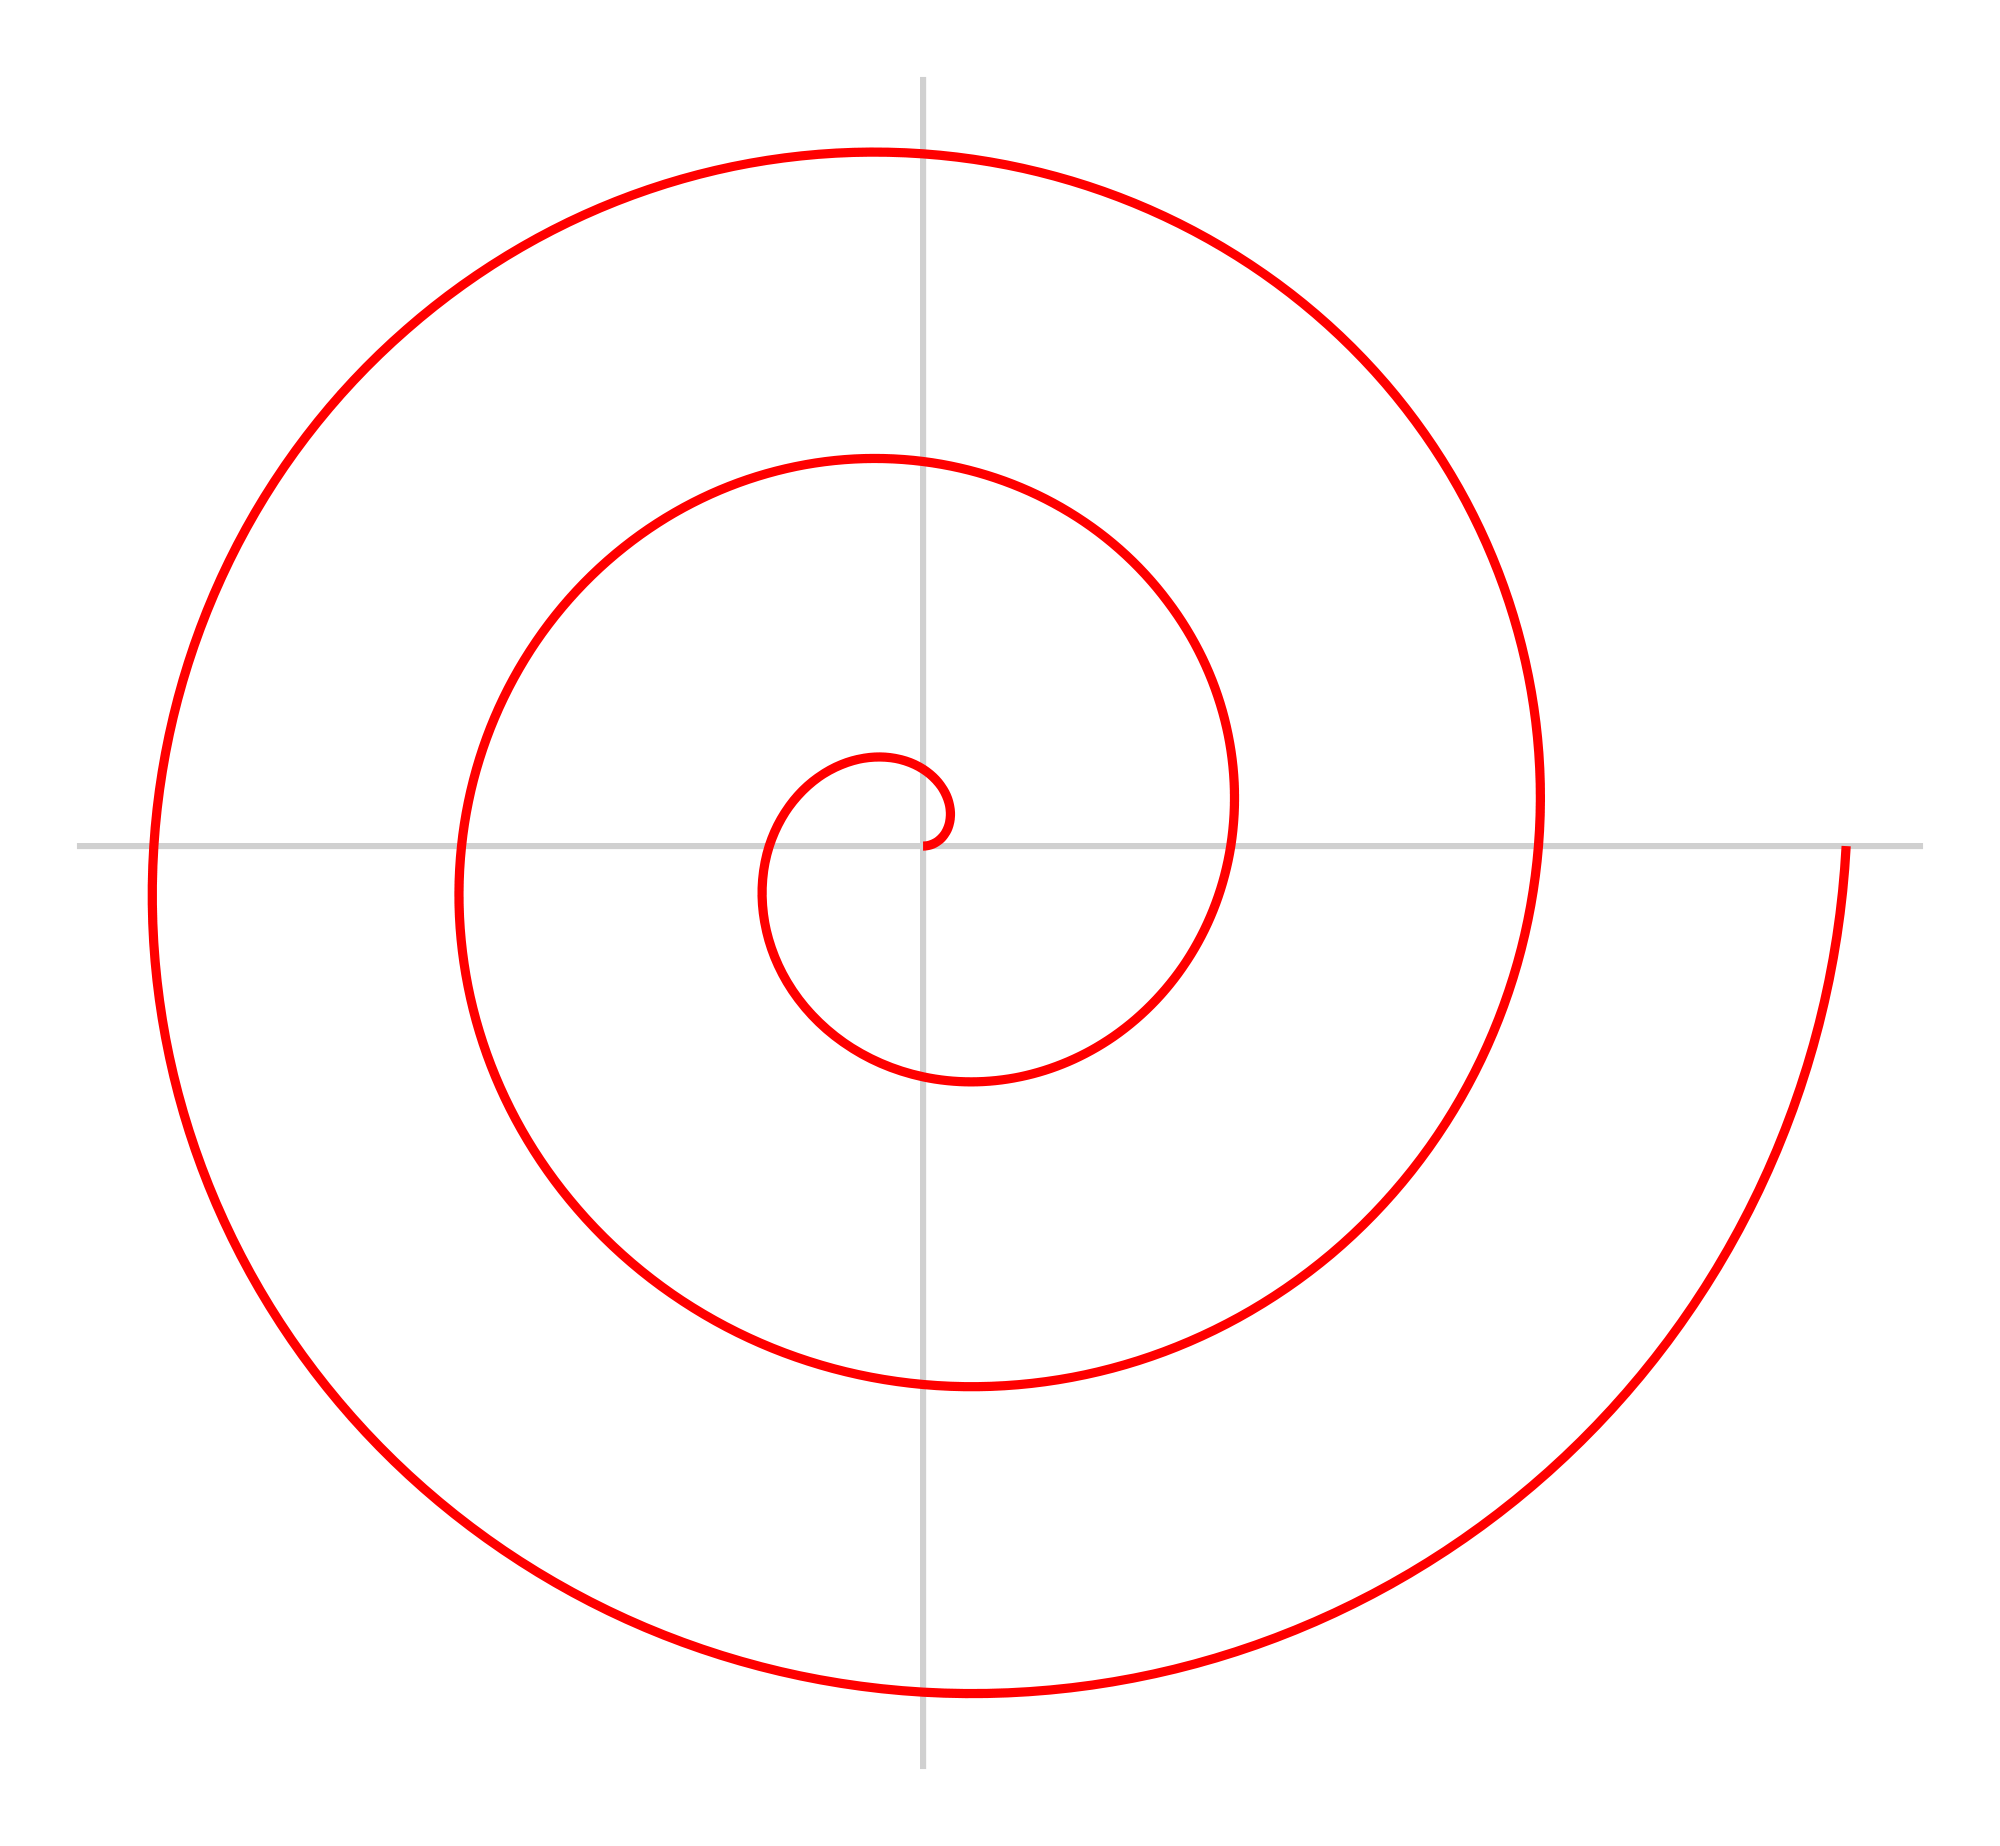 Galaxy clipart spiral vector. Free download clip art